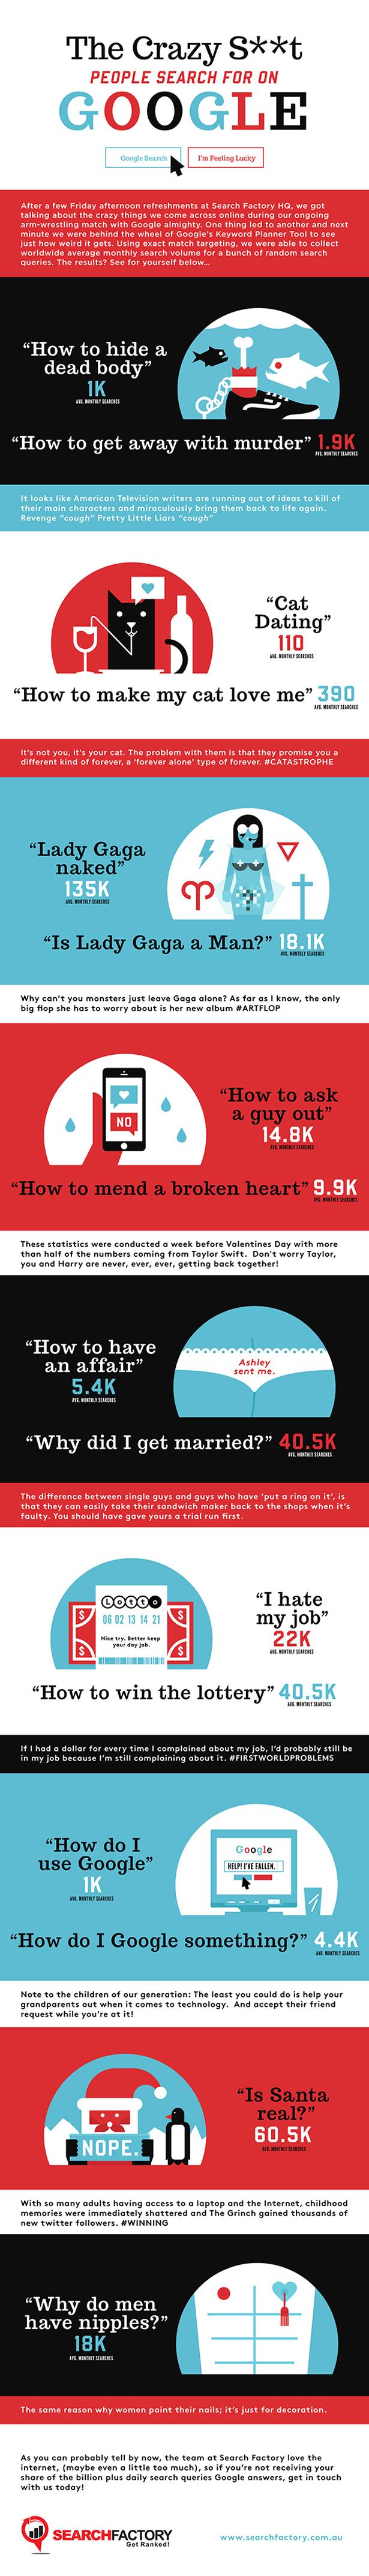 googling-infographic-2014